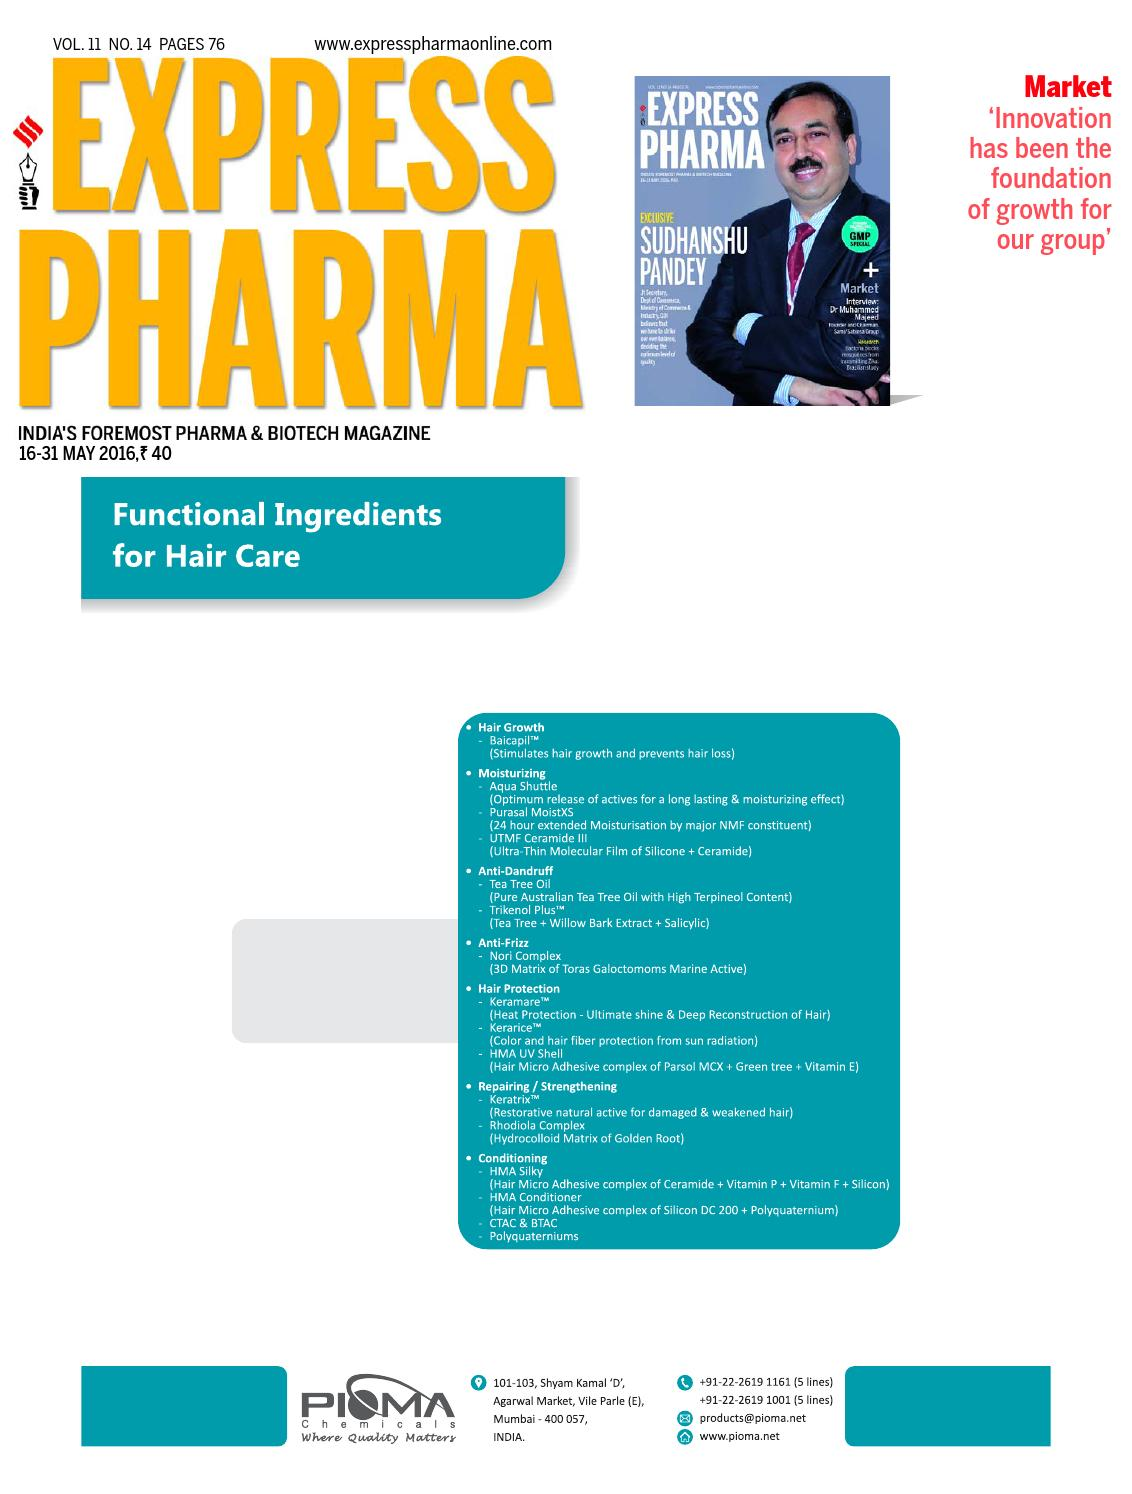 Express Pharma November 16-30, 2012 Part - 1 by Indian Express - issuu